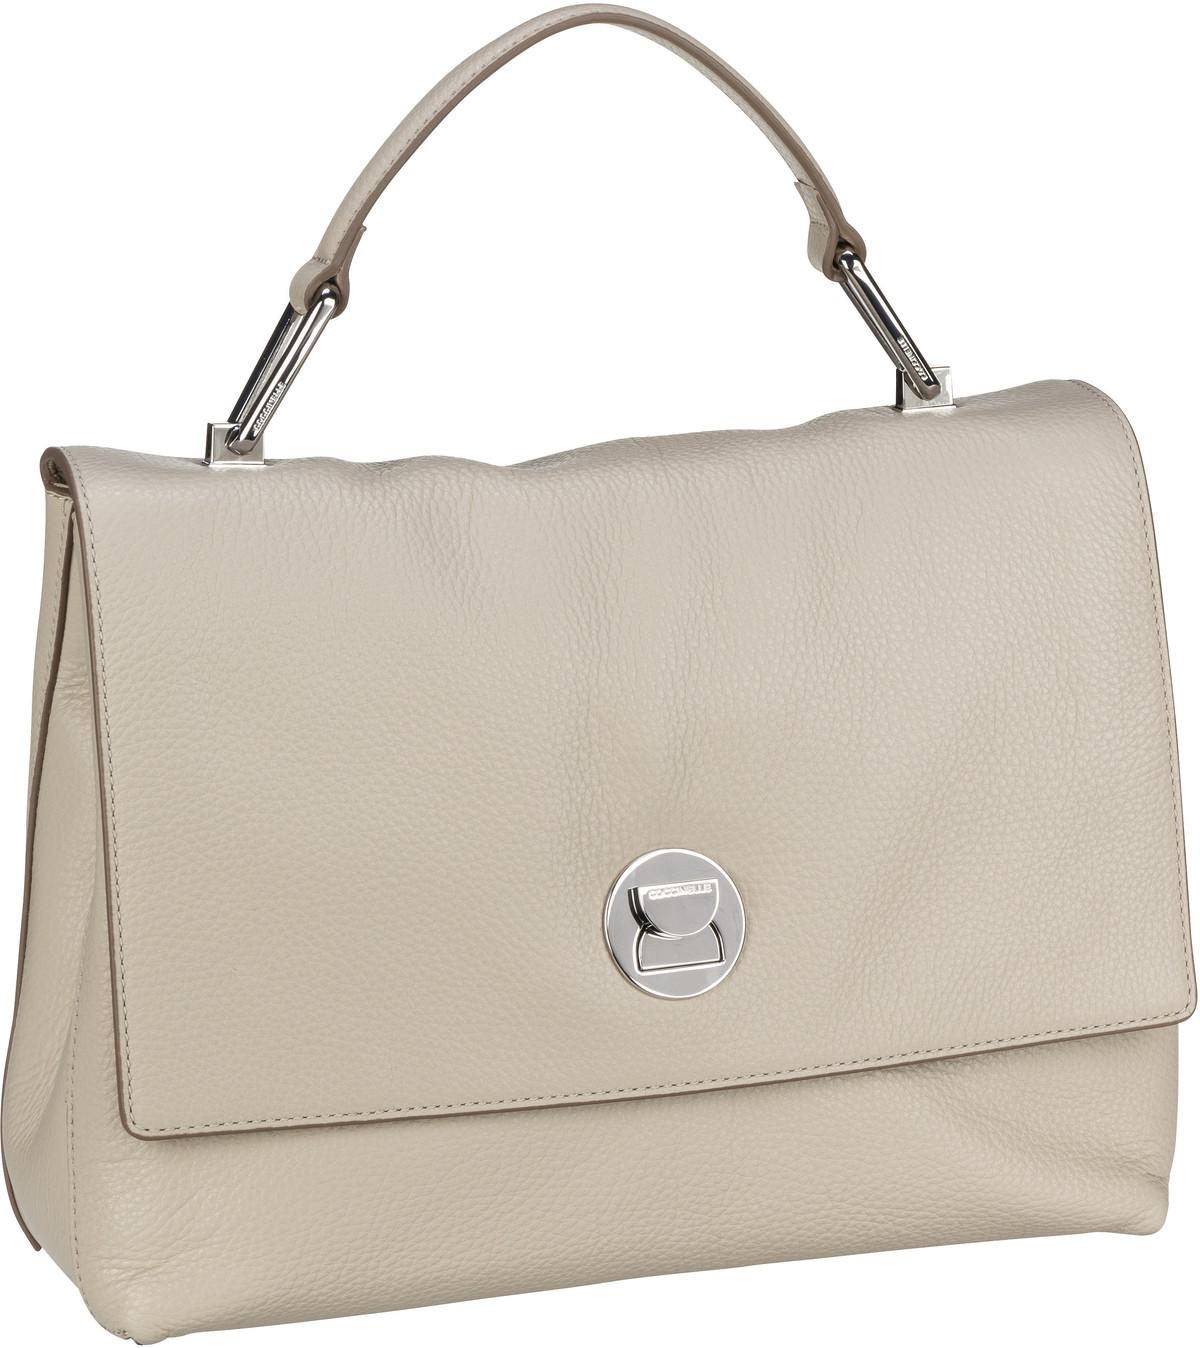 Handtasche Liya 1801 Seashell